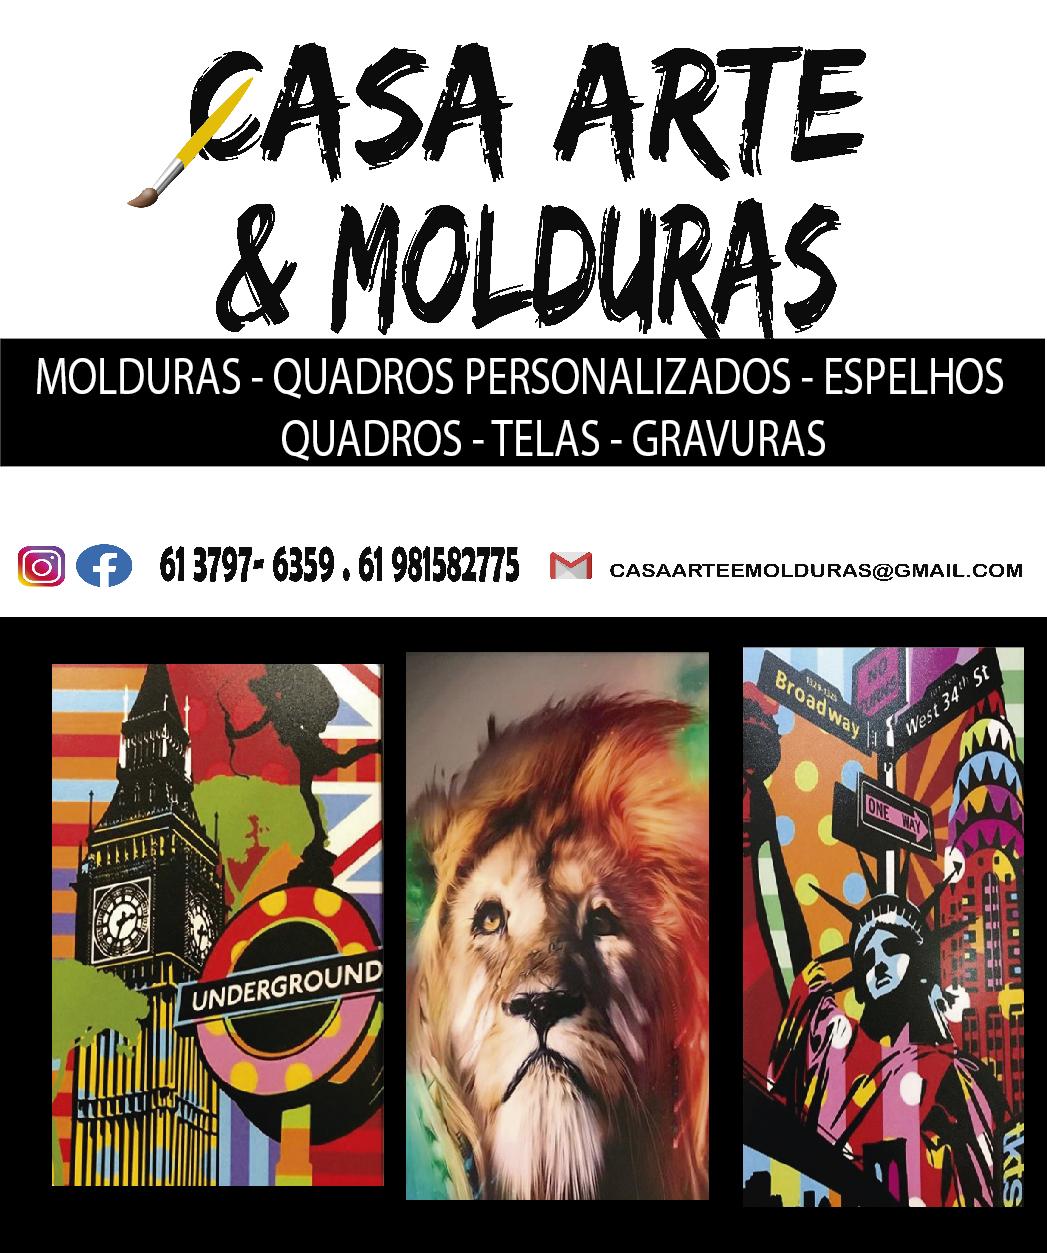 CASA DAS ARTES E MOLDURAS